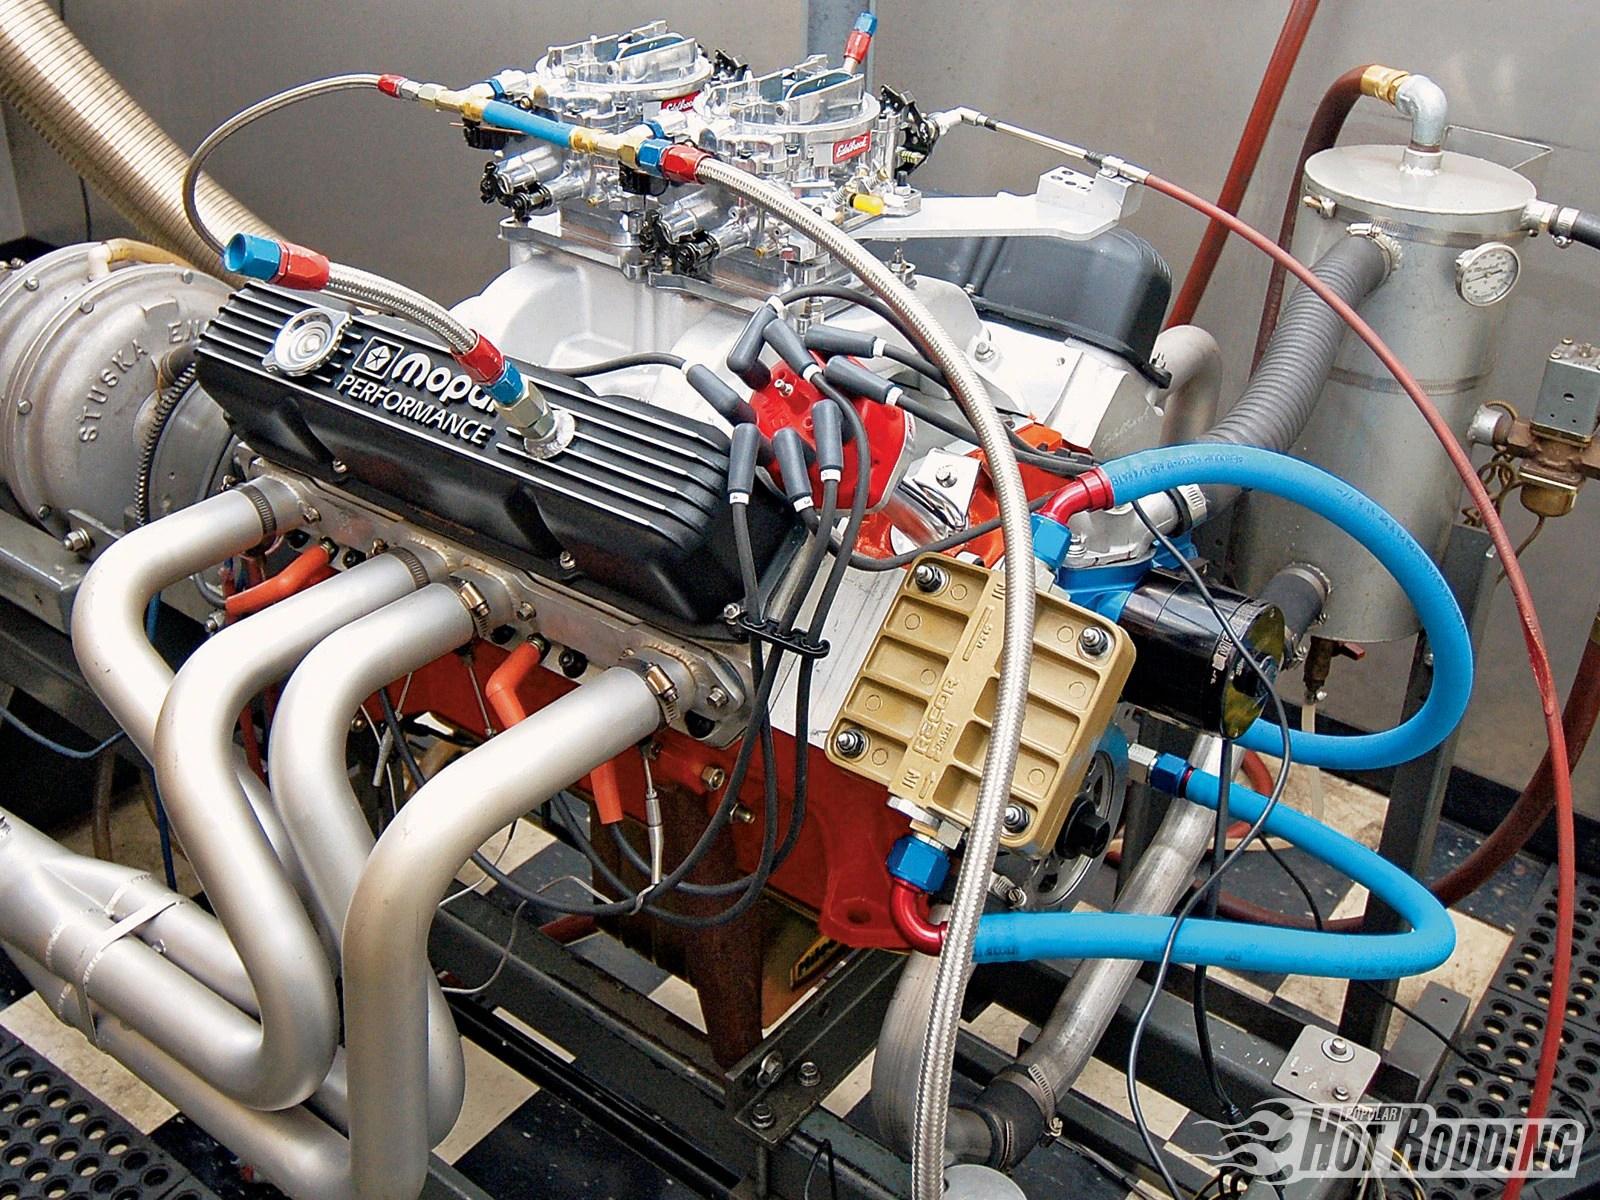 Dodge Dakota Fuel Pump Wiring Big Block Mopar Engines Hot Rod Network